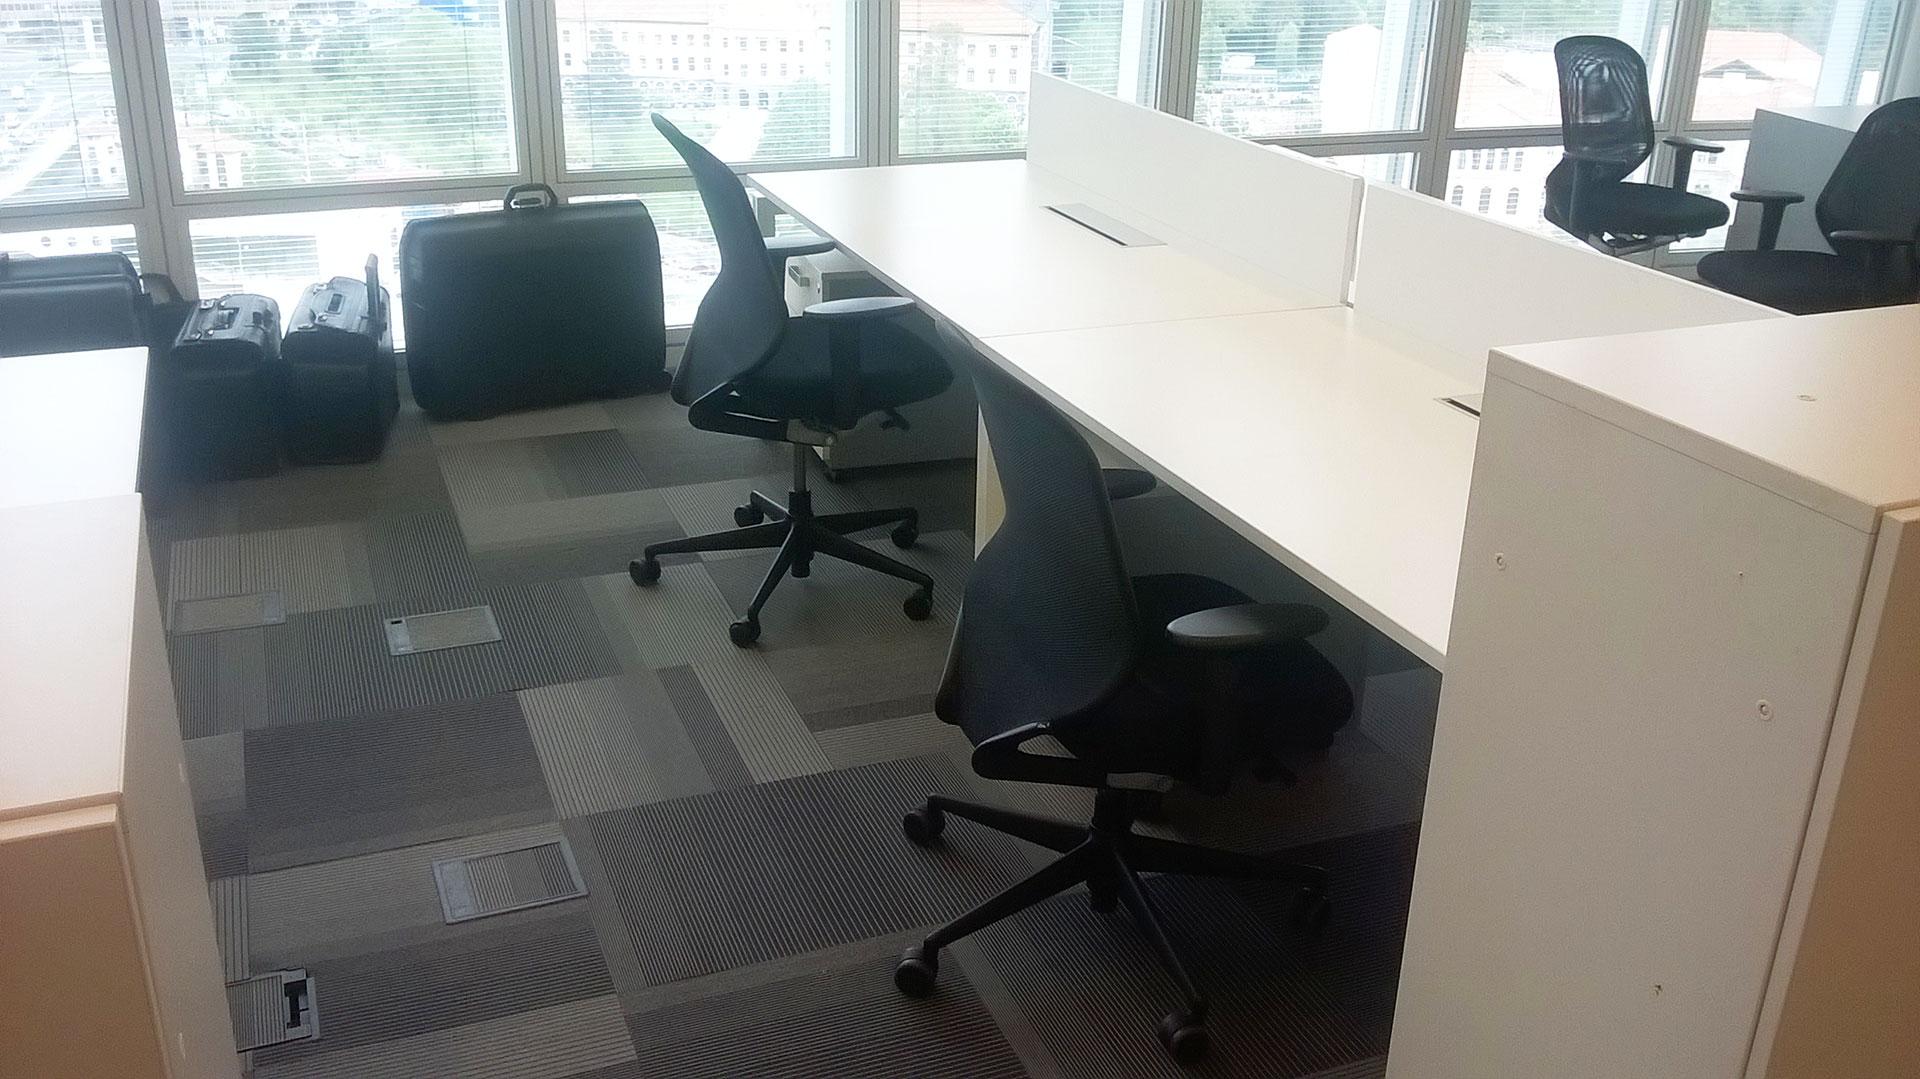 Oficinas de iberdrola en bilbao fabulous oficinas de for Oficinas iberdrola madrid